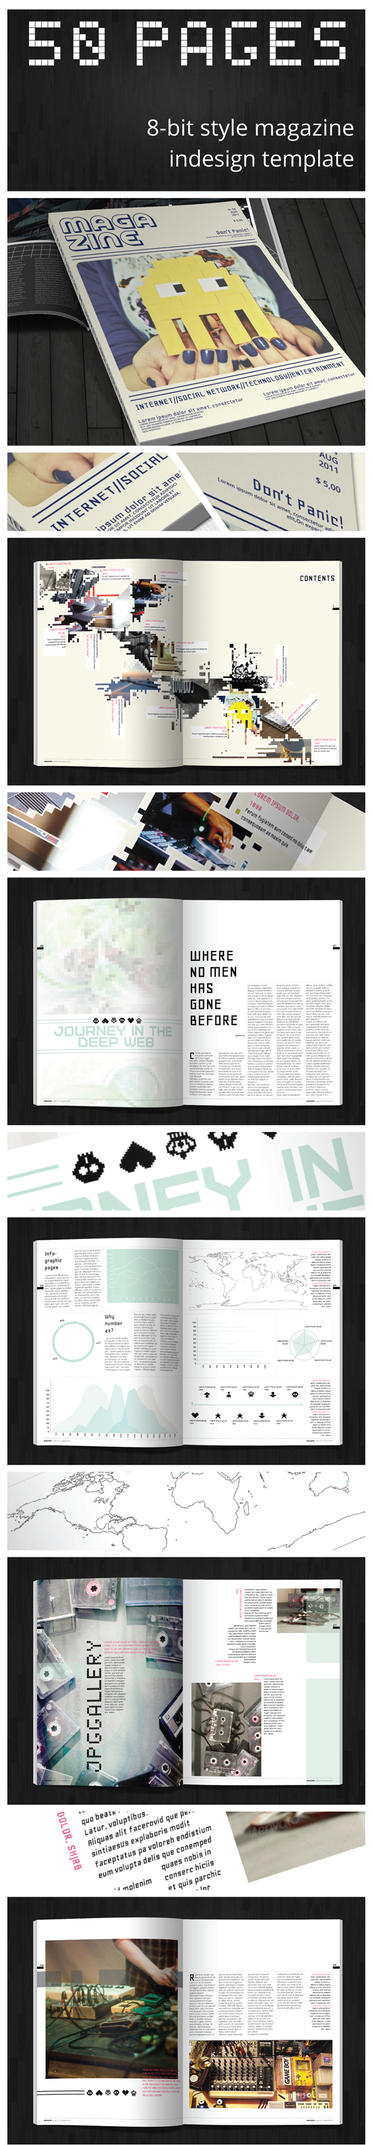 8-bit magazine template by duemilacentododici